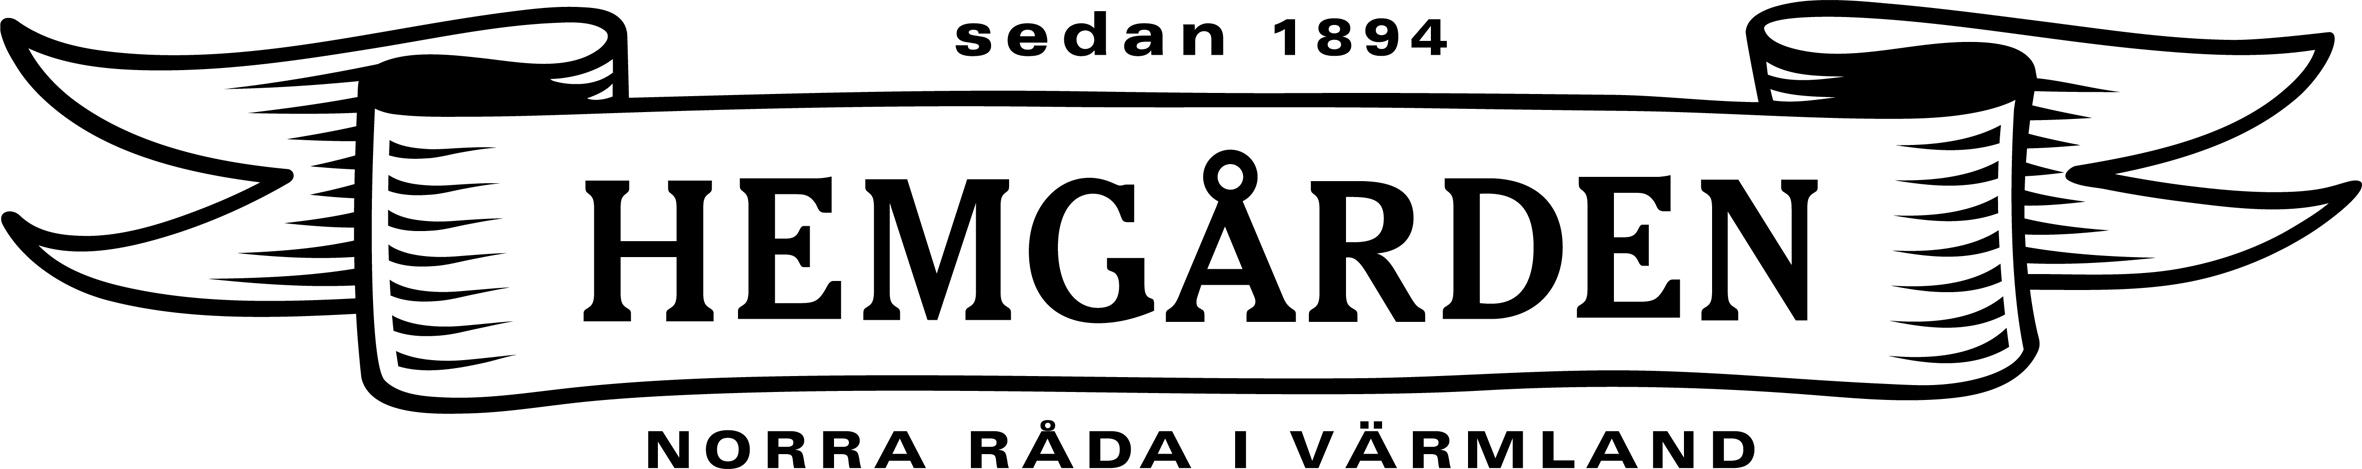 August Larsson chark - Hemgården